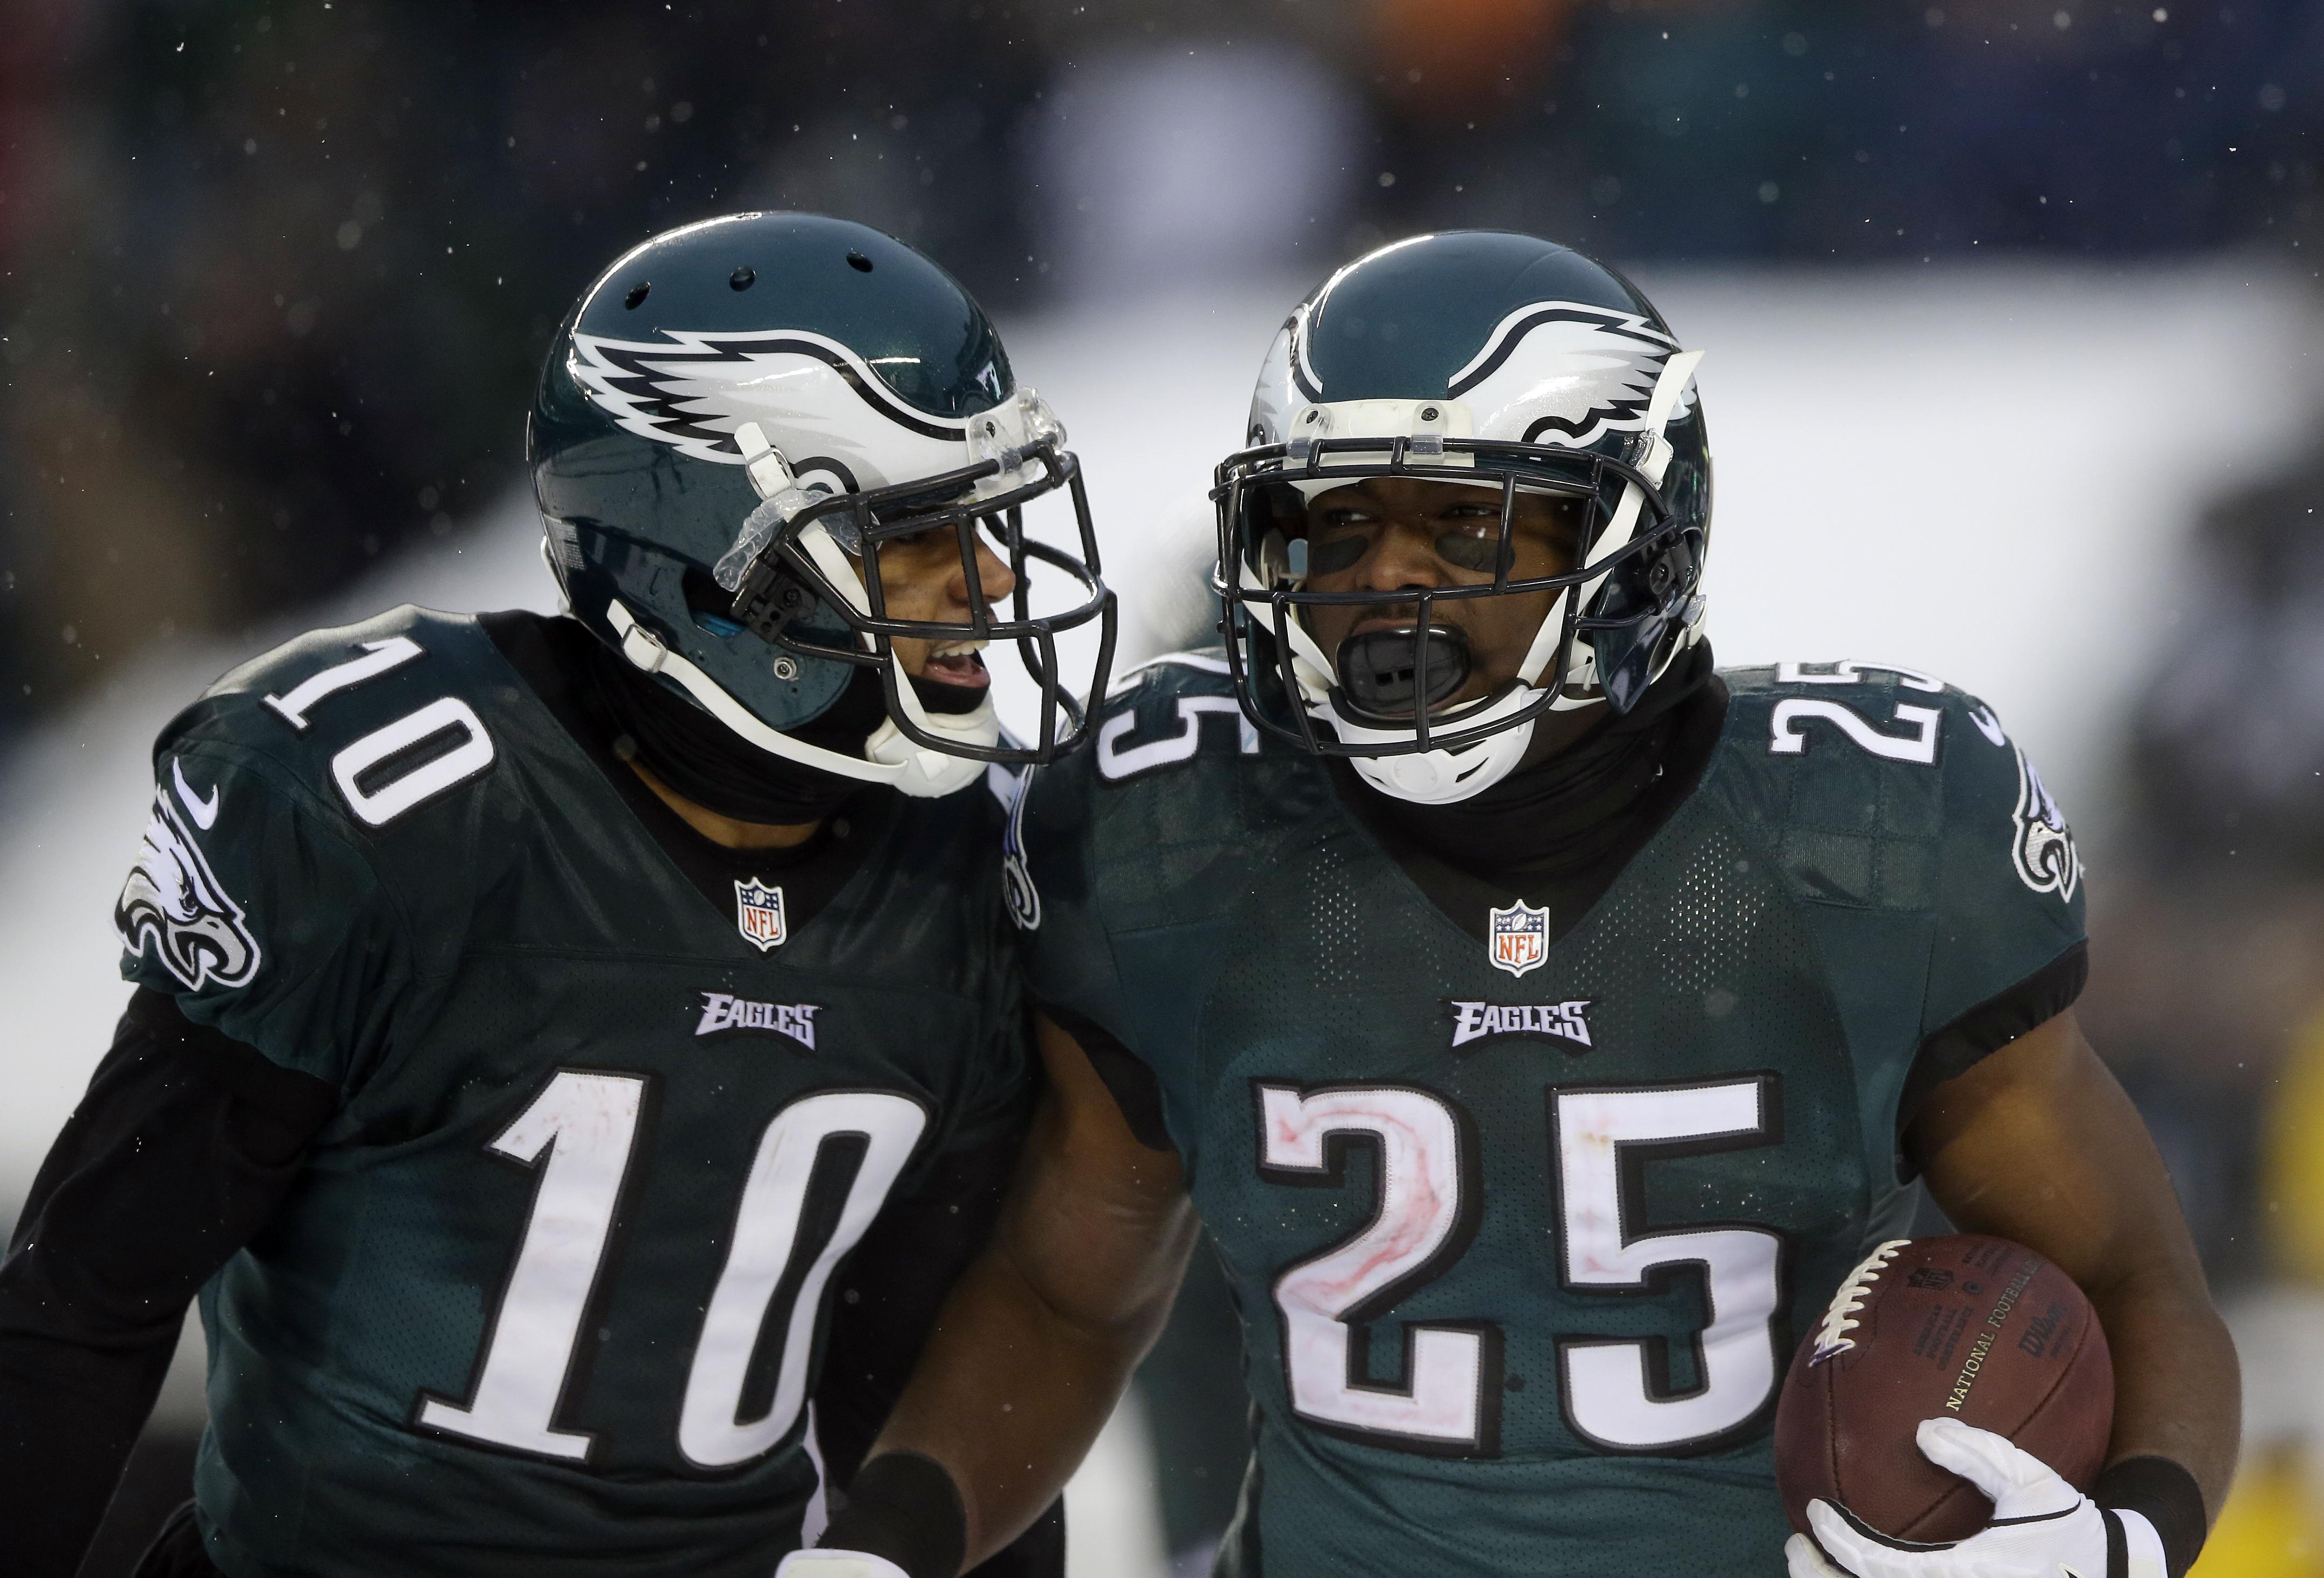 NFL rumors: Why ex-Eagles RB LeSean McCoy is still optimistic ...